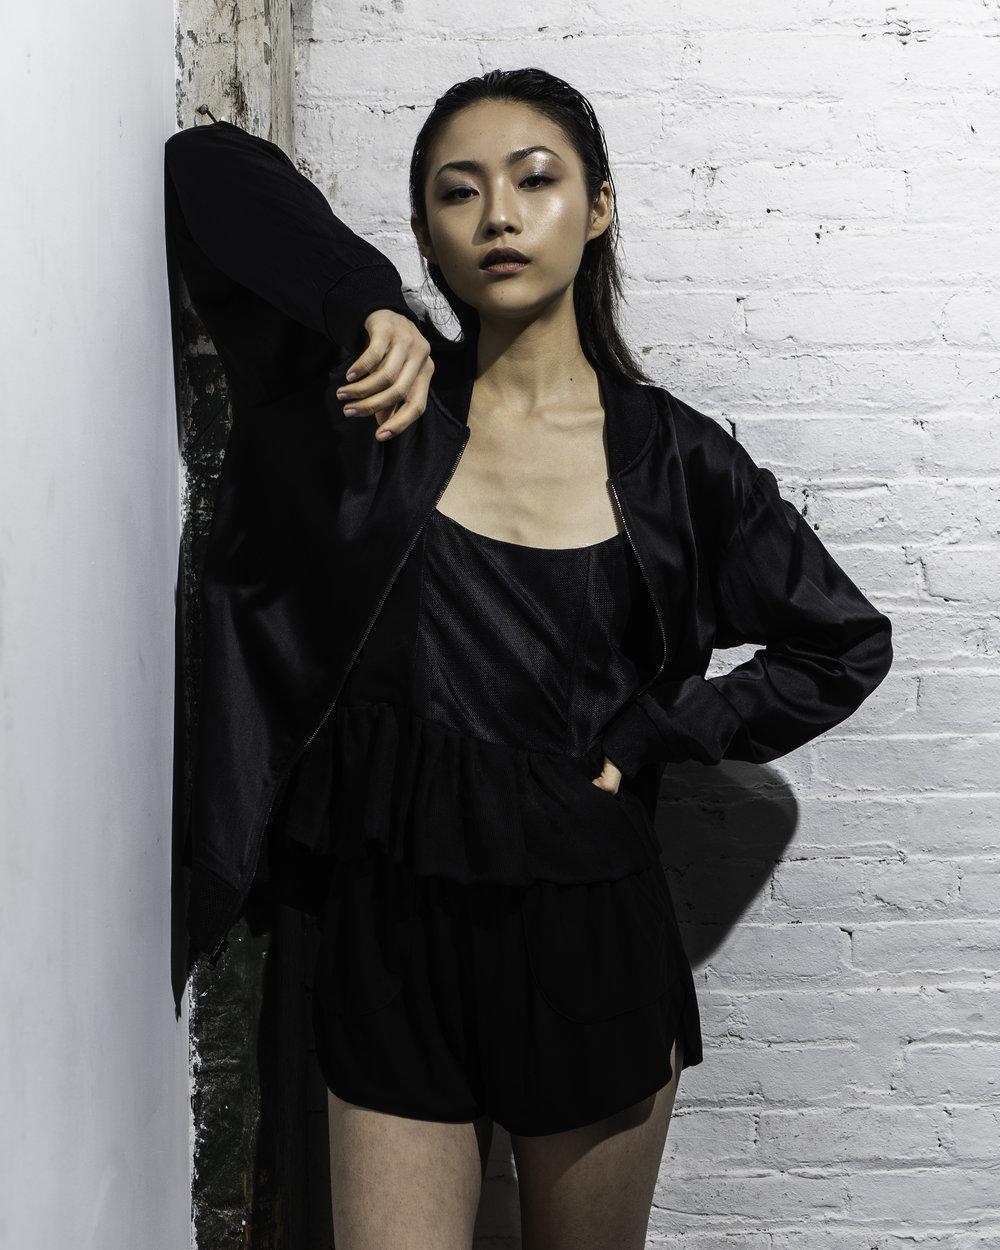 Photographer: Zach Han | Model: Crystal Yueyaoli